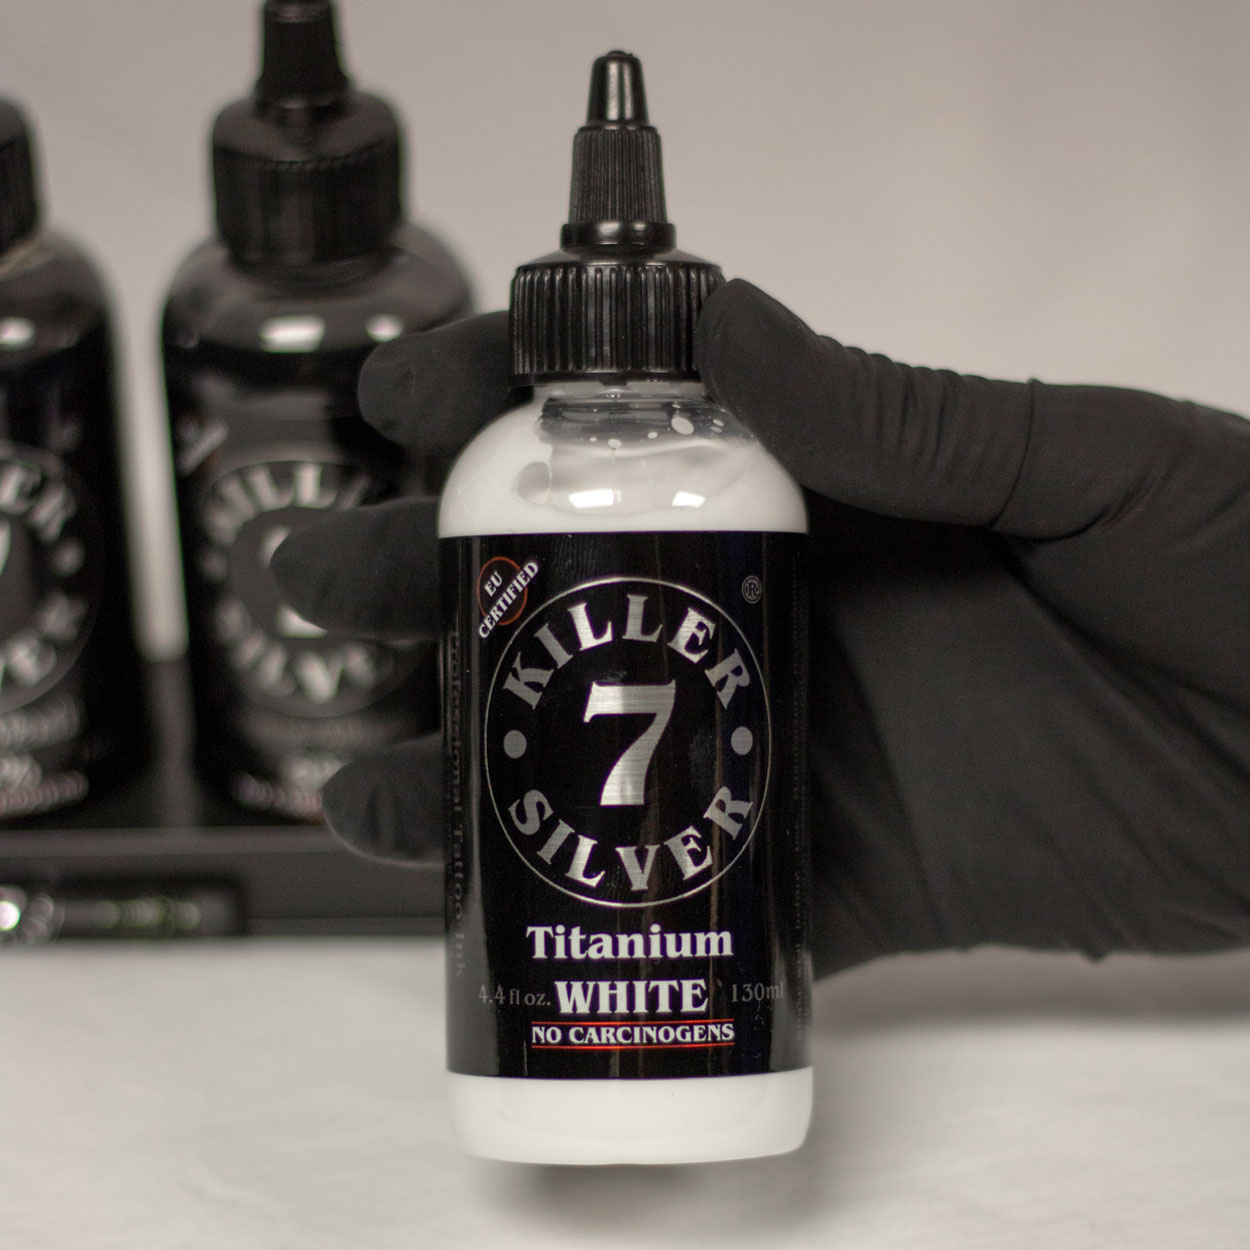 Titanium White-Professional Tattoo Ink-4.4 oz-Killer Silver